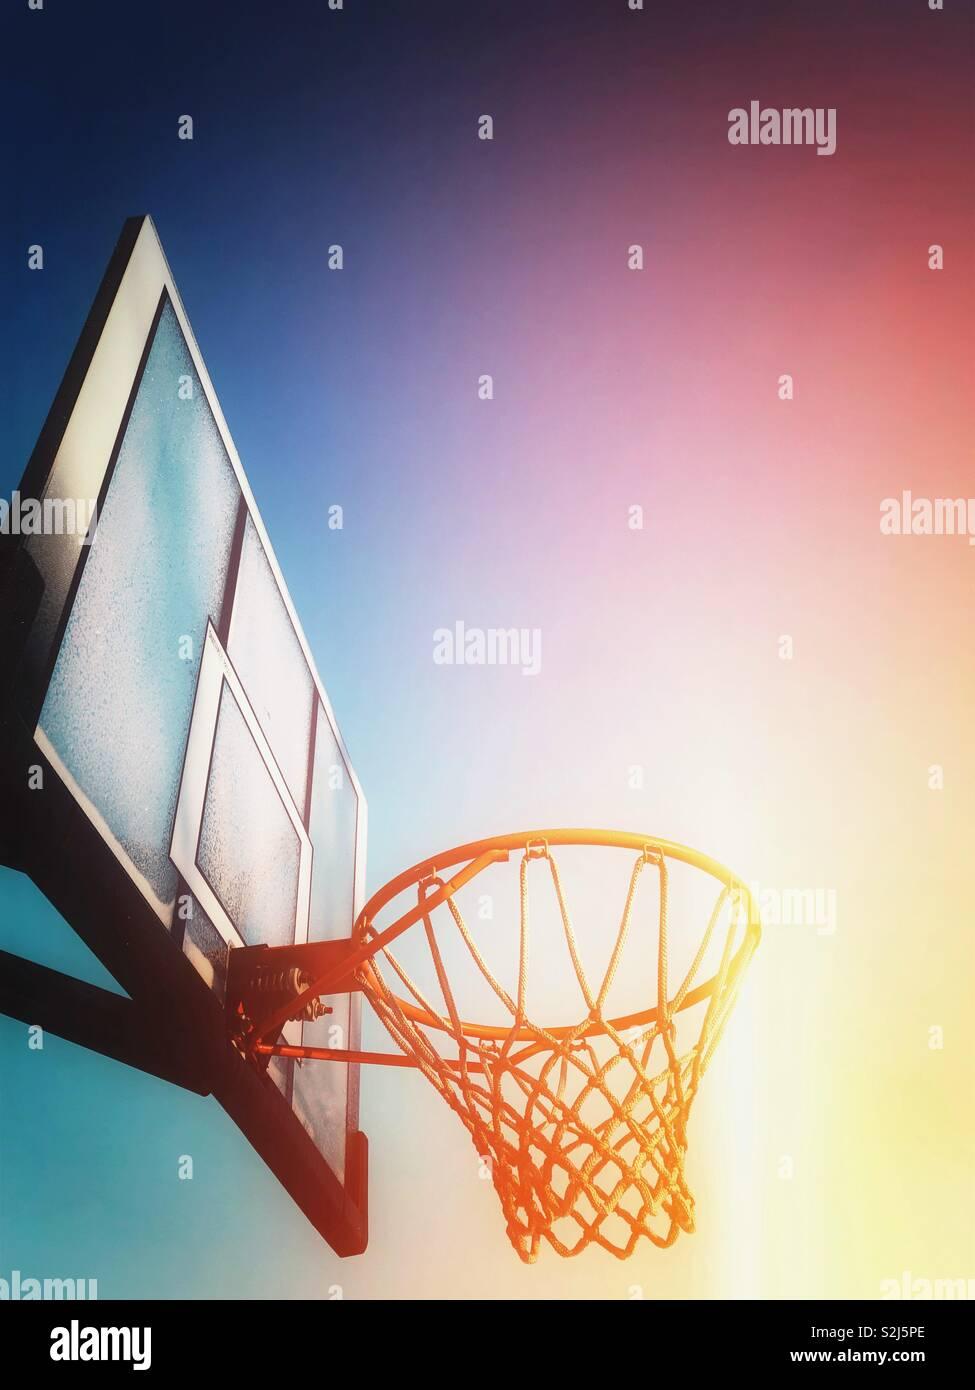 Guardando il basket net Foto Stock